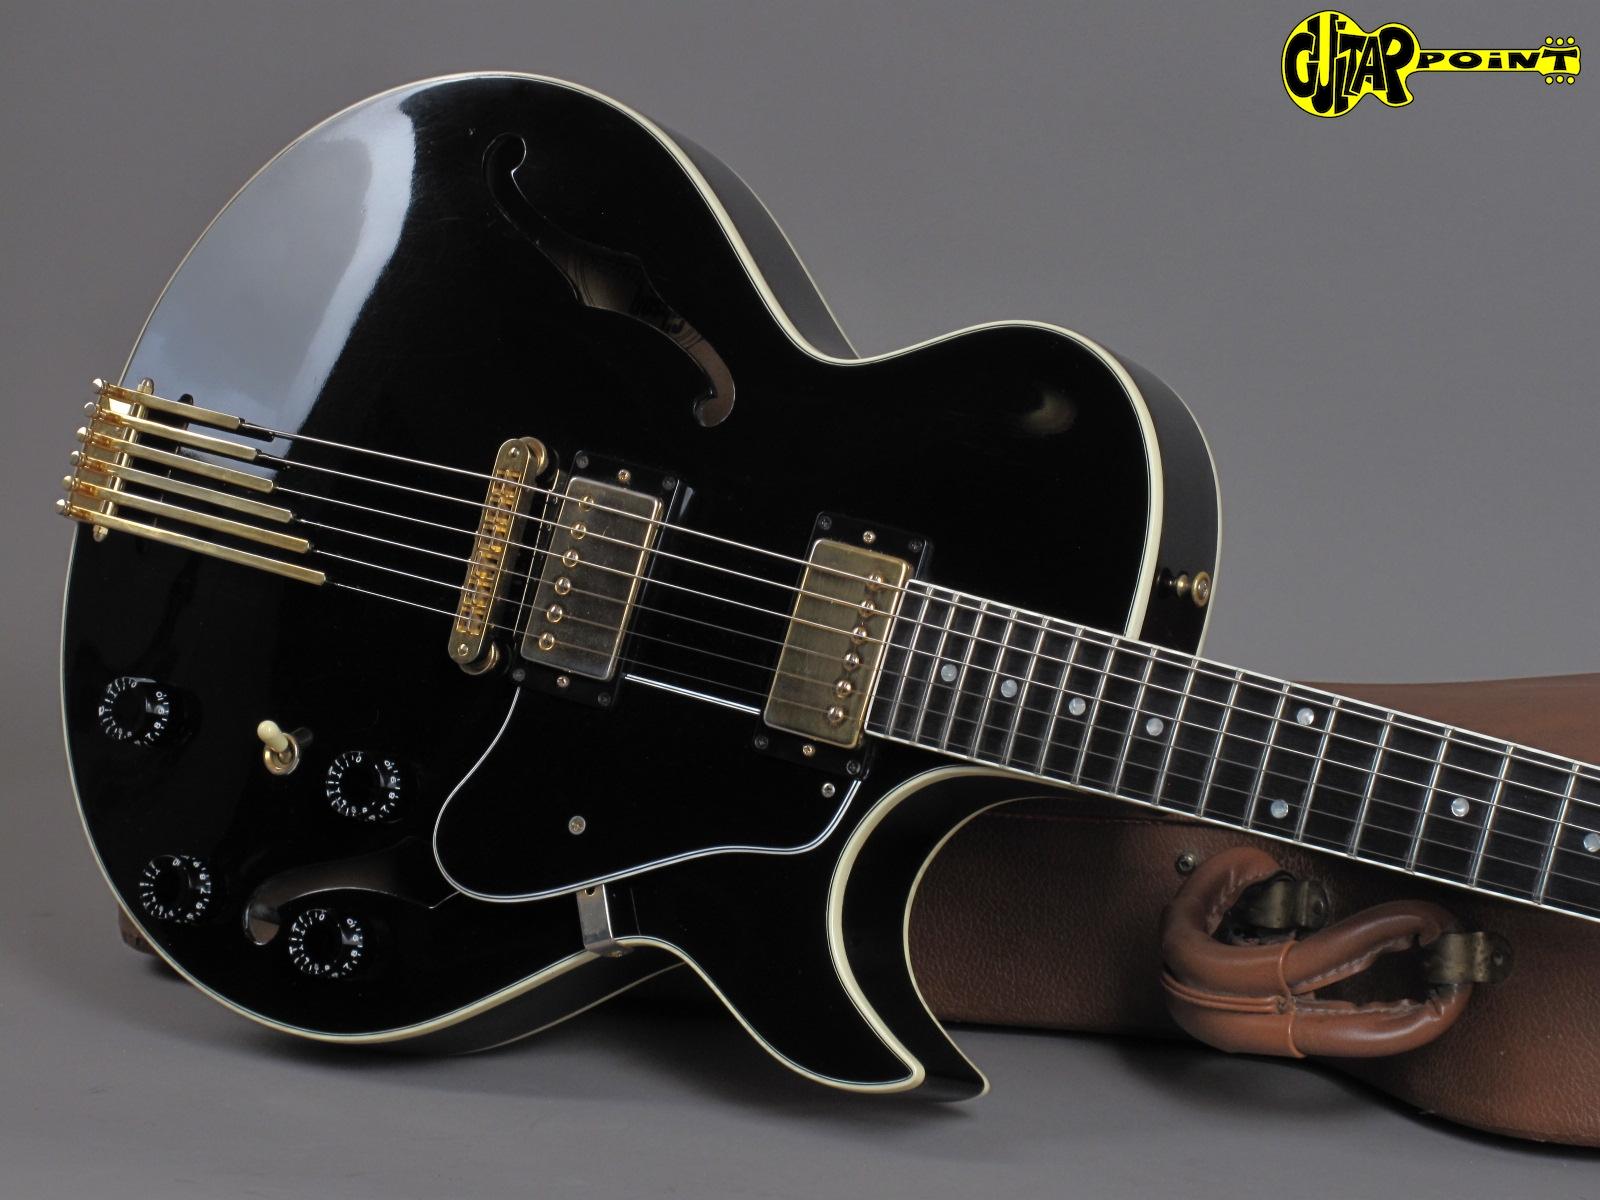 https://guitarpoint.de/app/uploads/products/1997-gibson-howard-roberts-fusion-ebony/Gibson97HR_Eb94017200_19.jpg